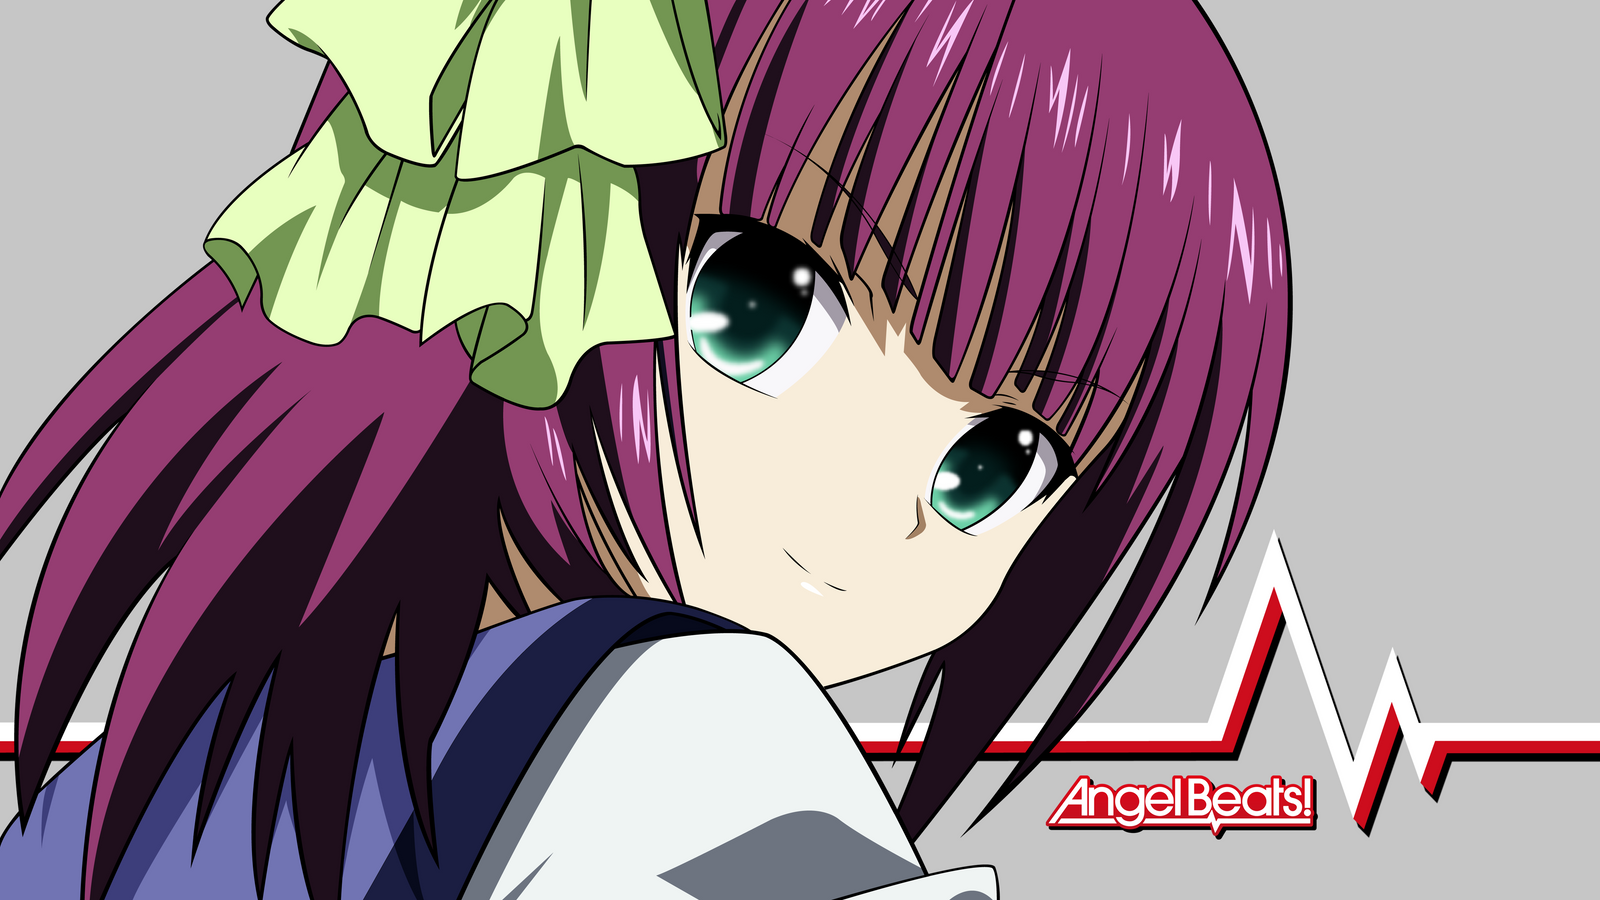 angel beats yuri - photo #24